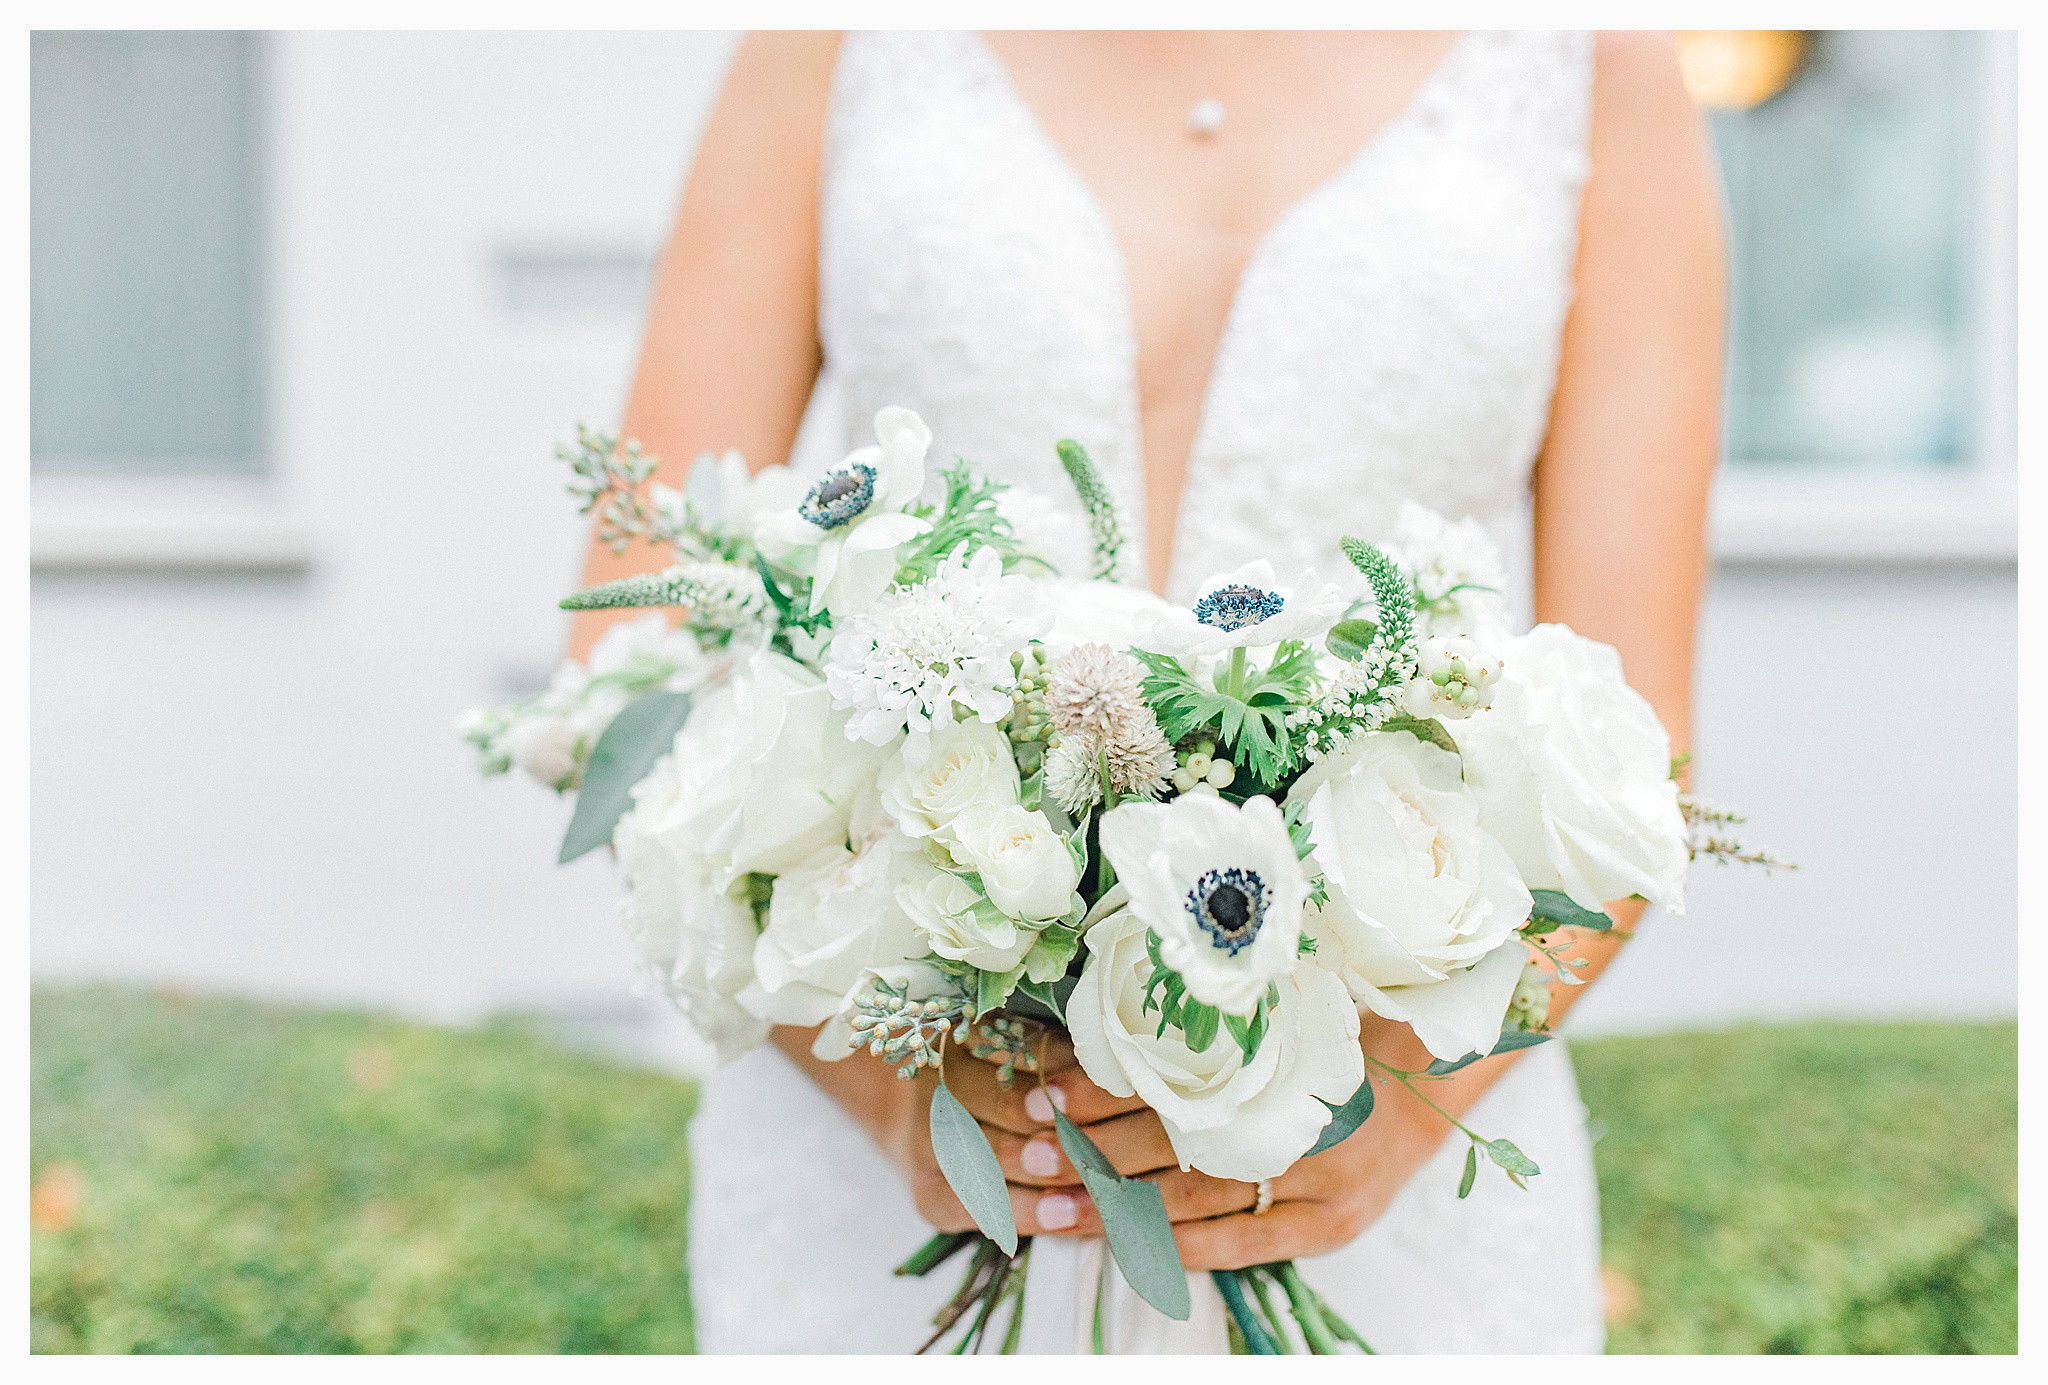 Emma Rose Company Light and Airy Wedding Photographer, Beautiful fall wedding at Rock Creek Gardens Venue in Puyallup, Washington._0135.jpg